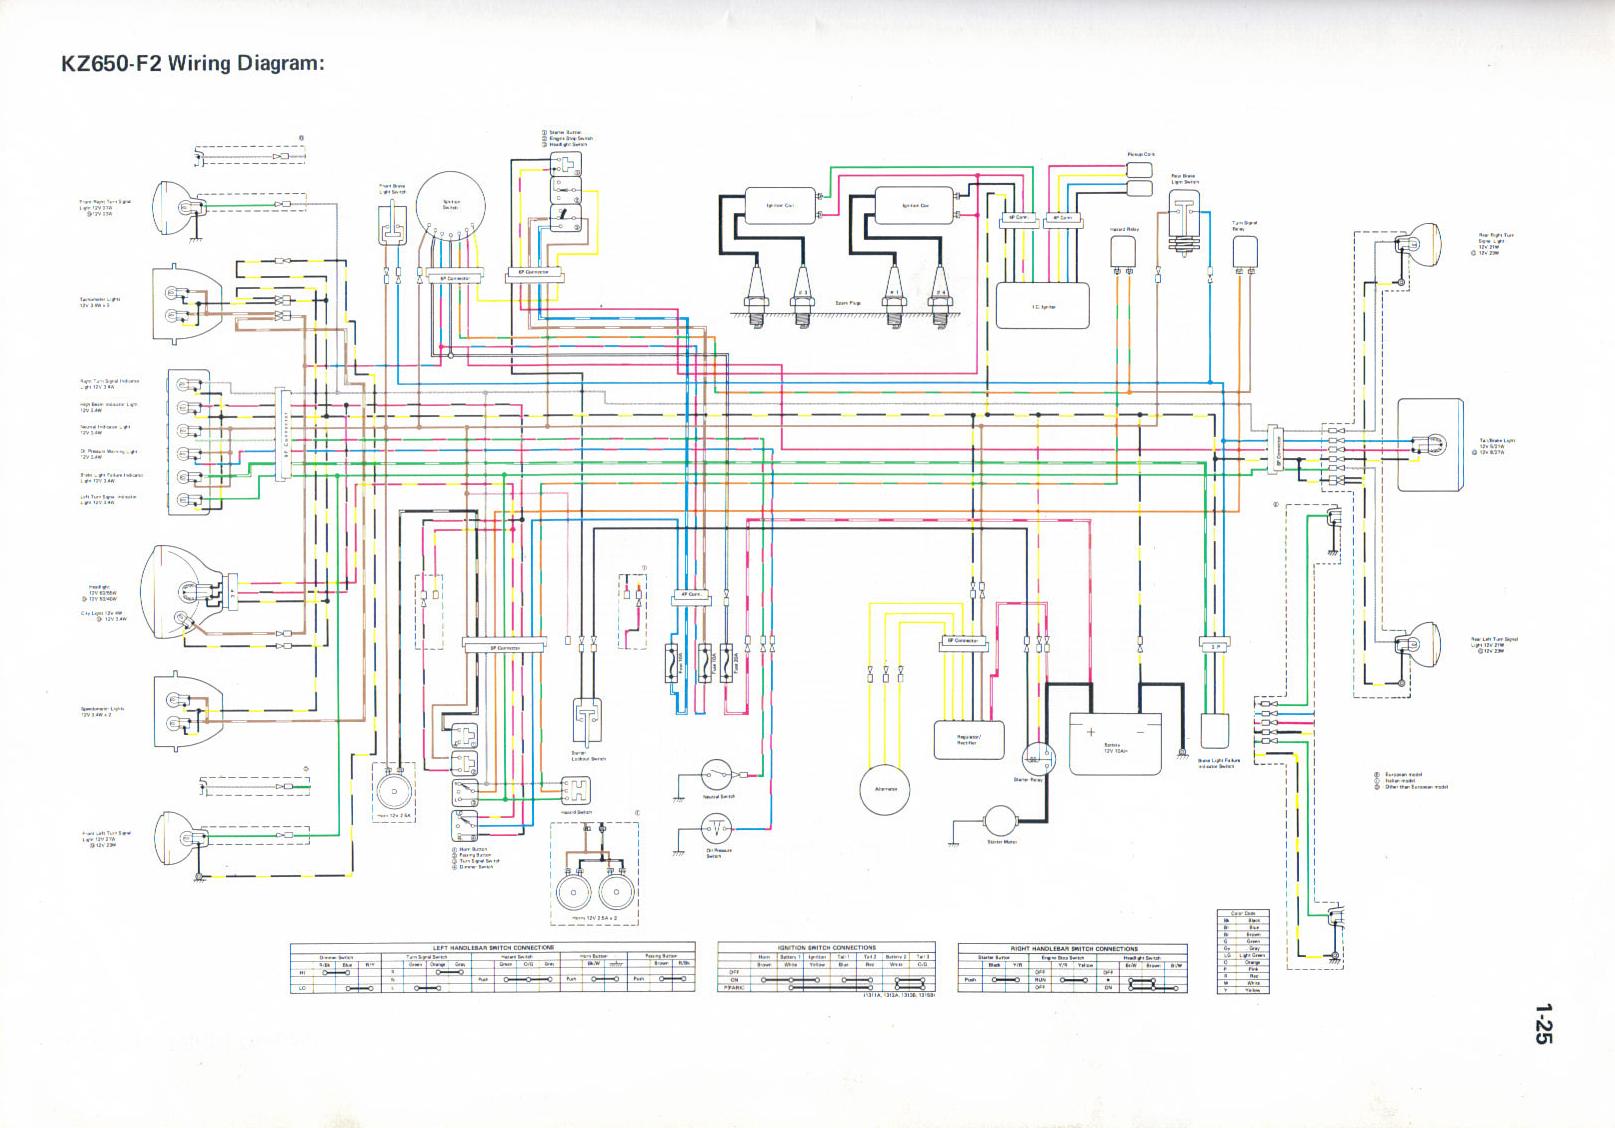 [DIAGRAM_4FR]  YR_6276] Kzrider Archives Wiring Diagram For Z650 Kawasaki Kz Motorcycles | Kz650 Wiring Diagram |  | Unre Trua Odga Mohammedshrine Librar Wiring 101